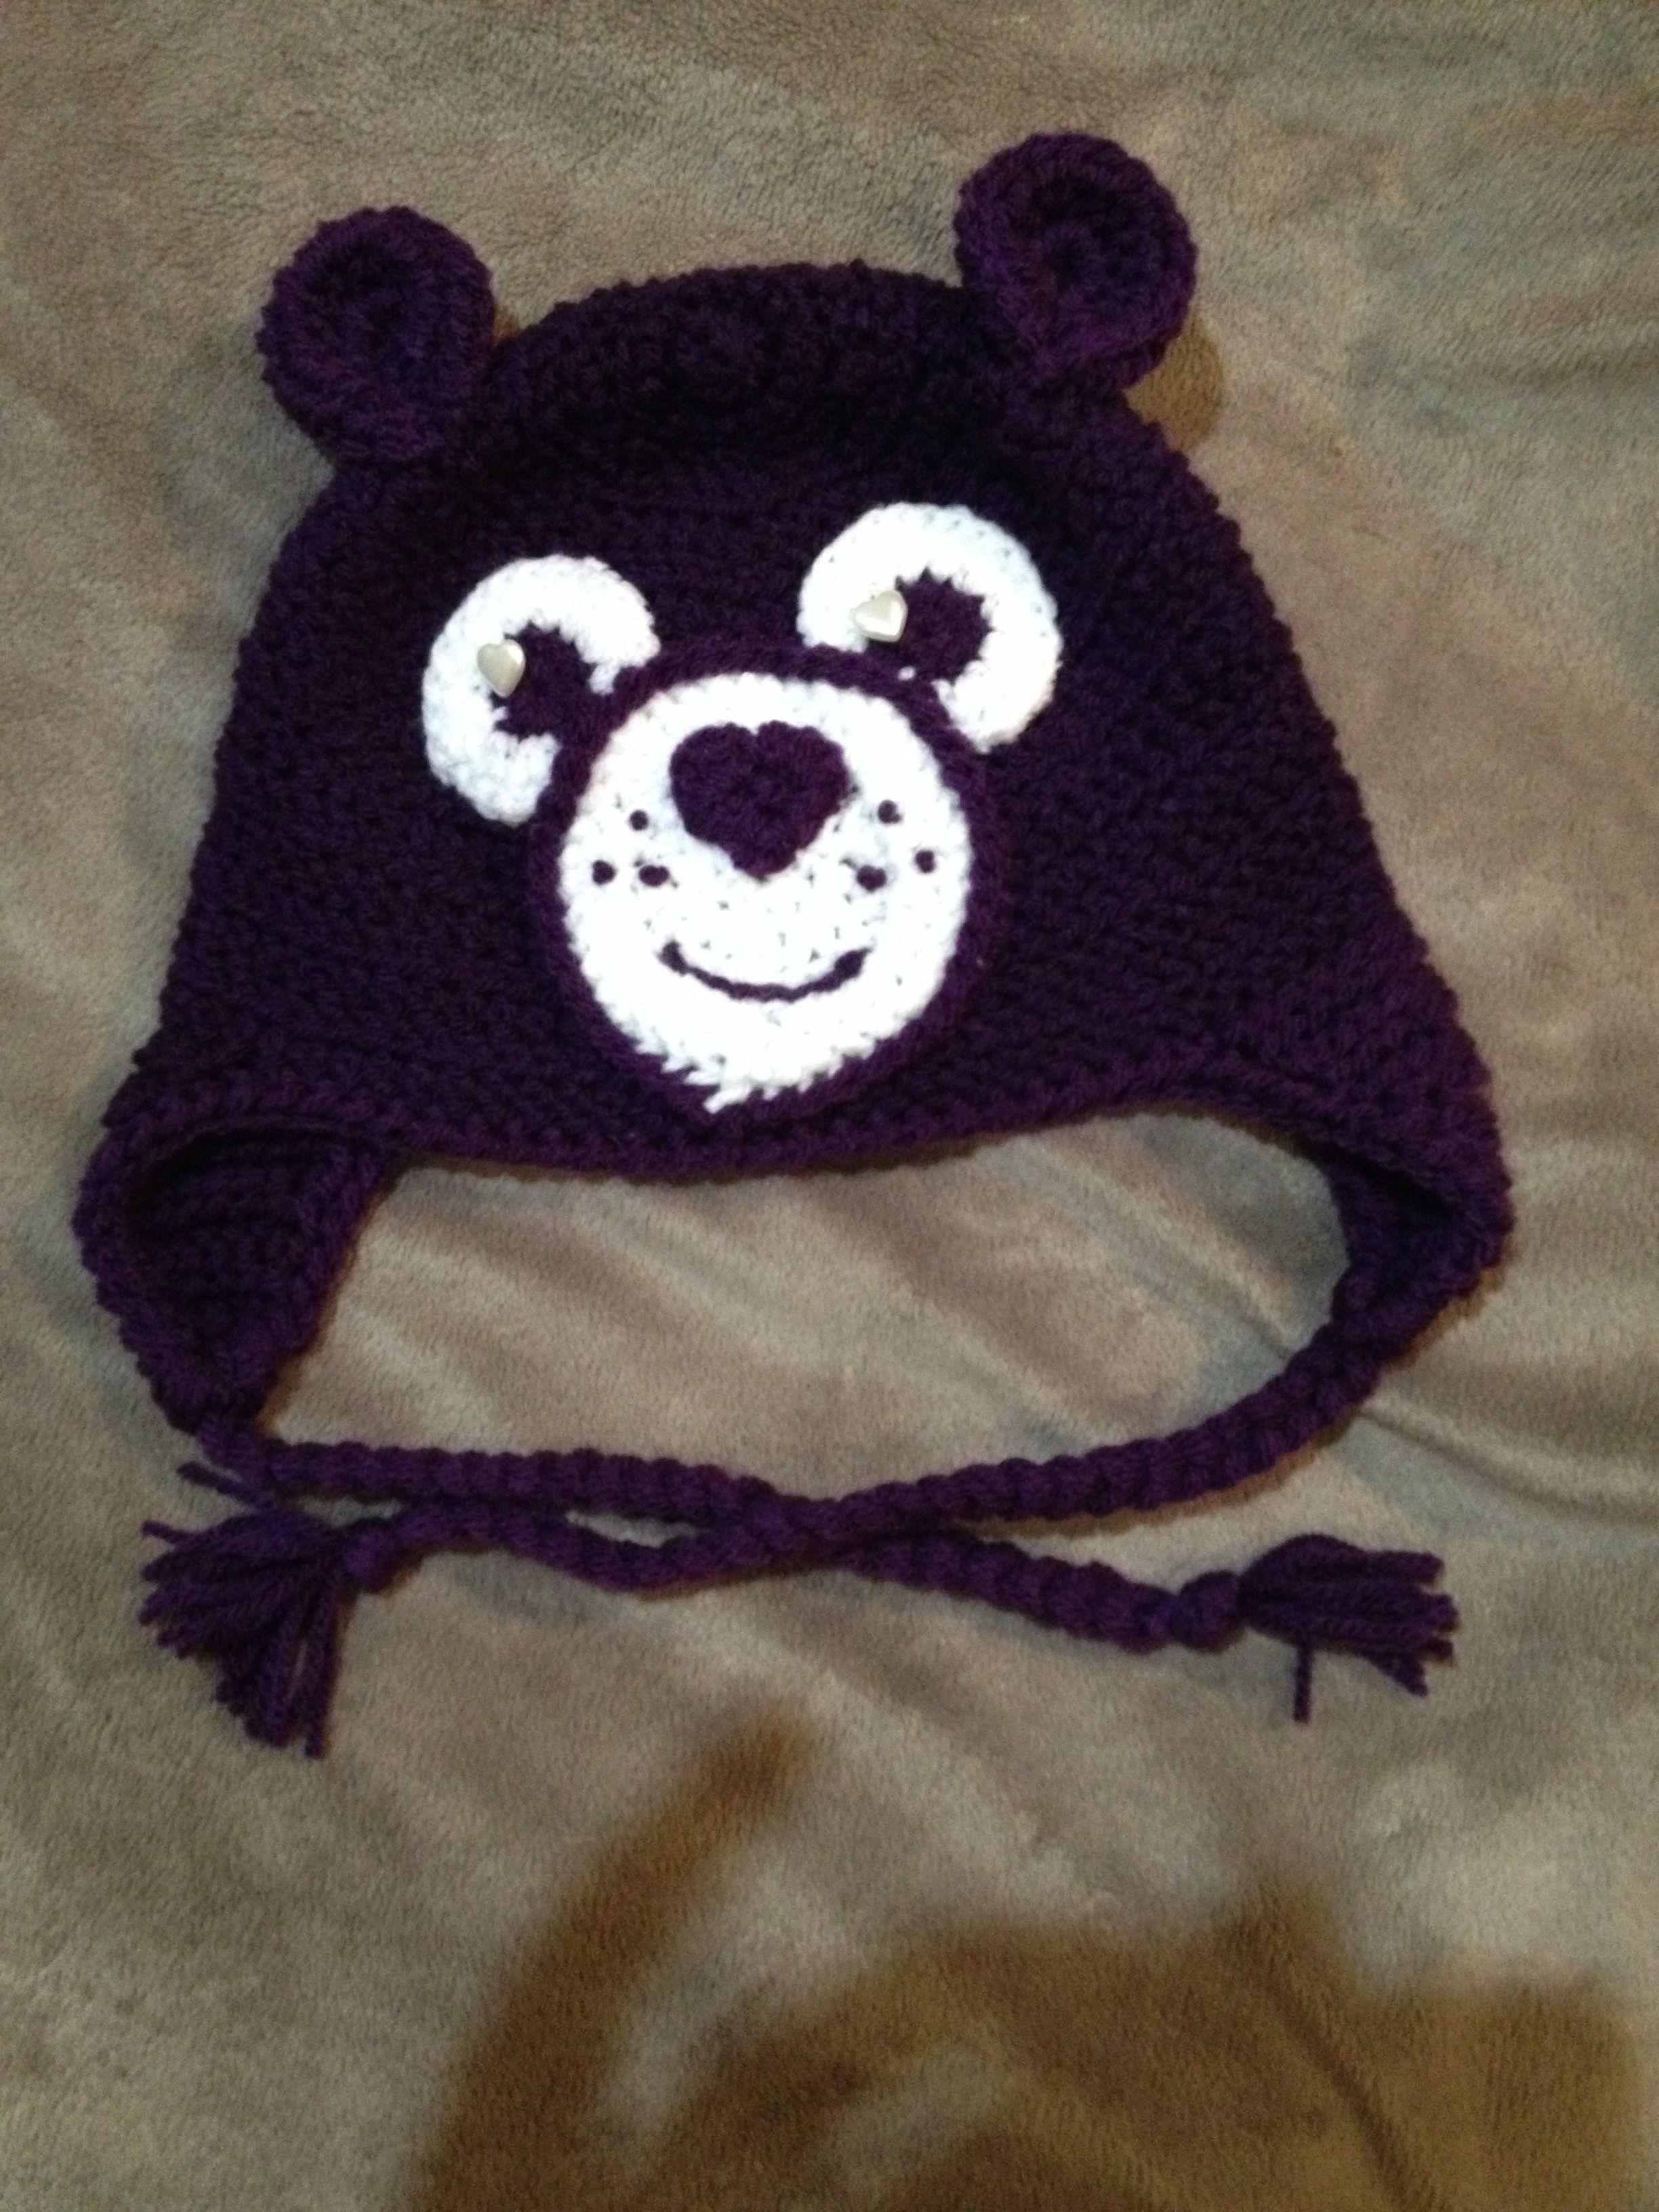 Deep purple care bear hat | Crochet & knitted items | Pinterest